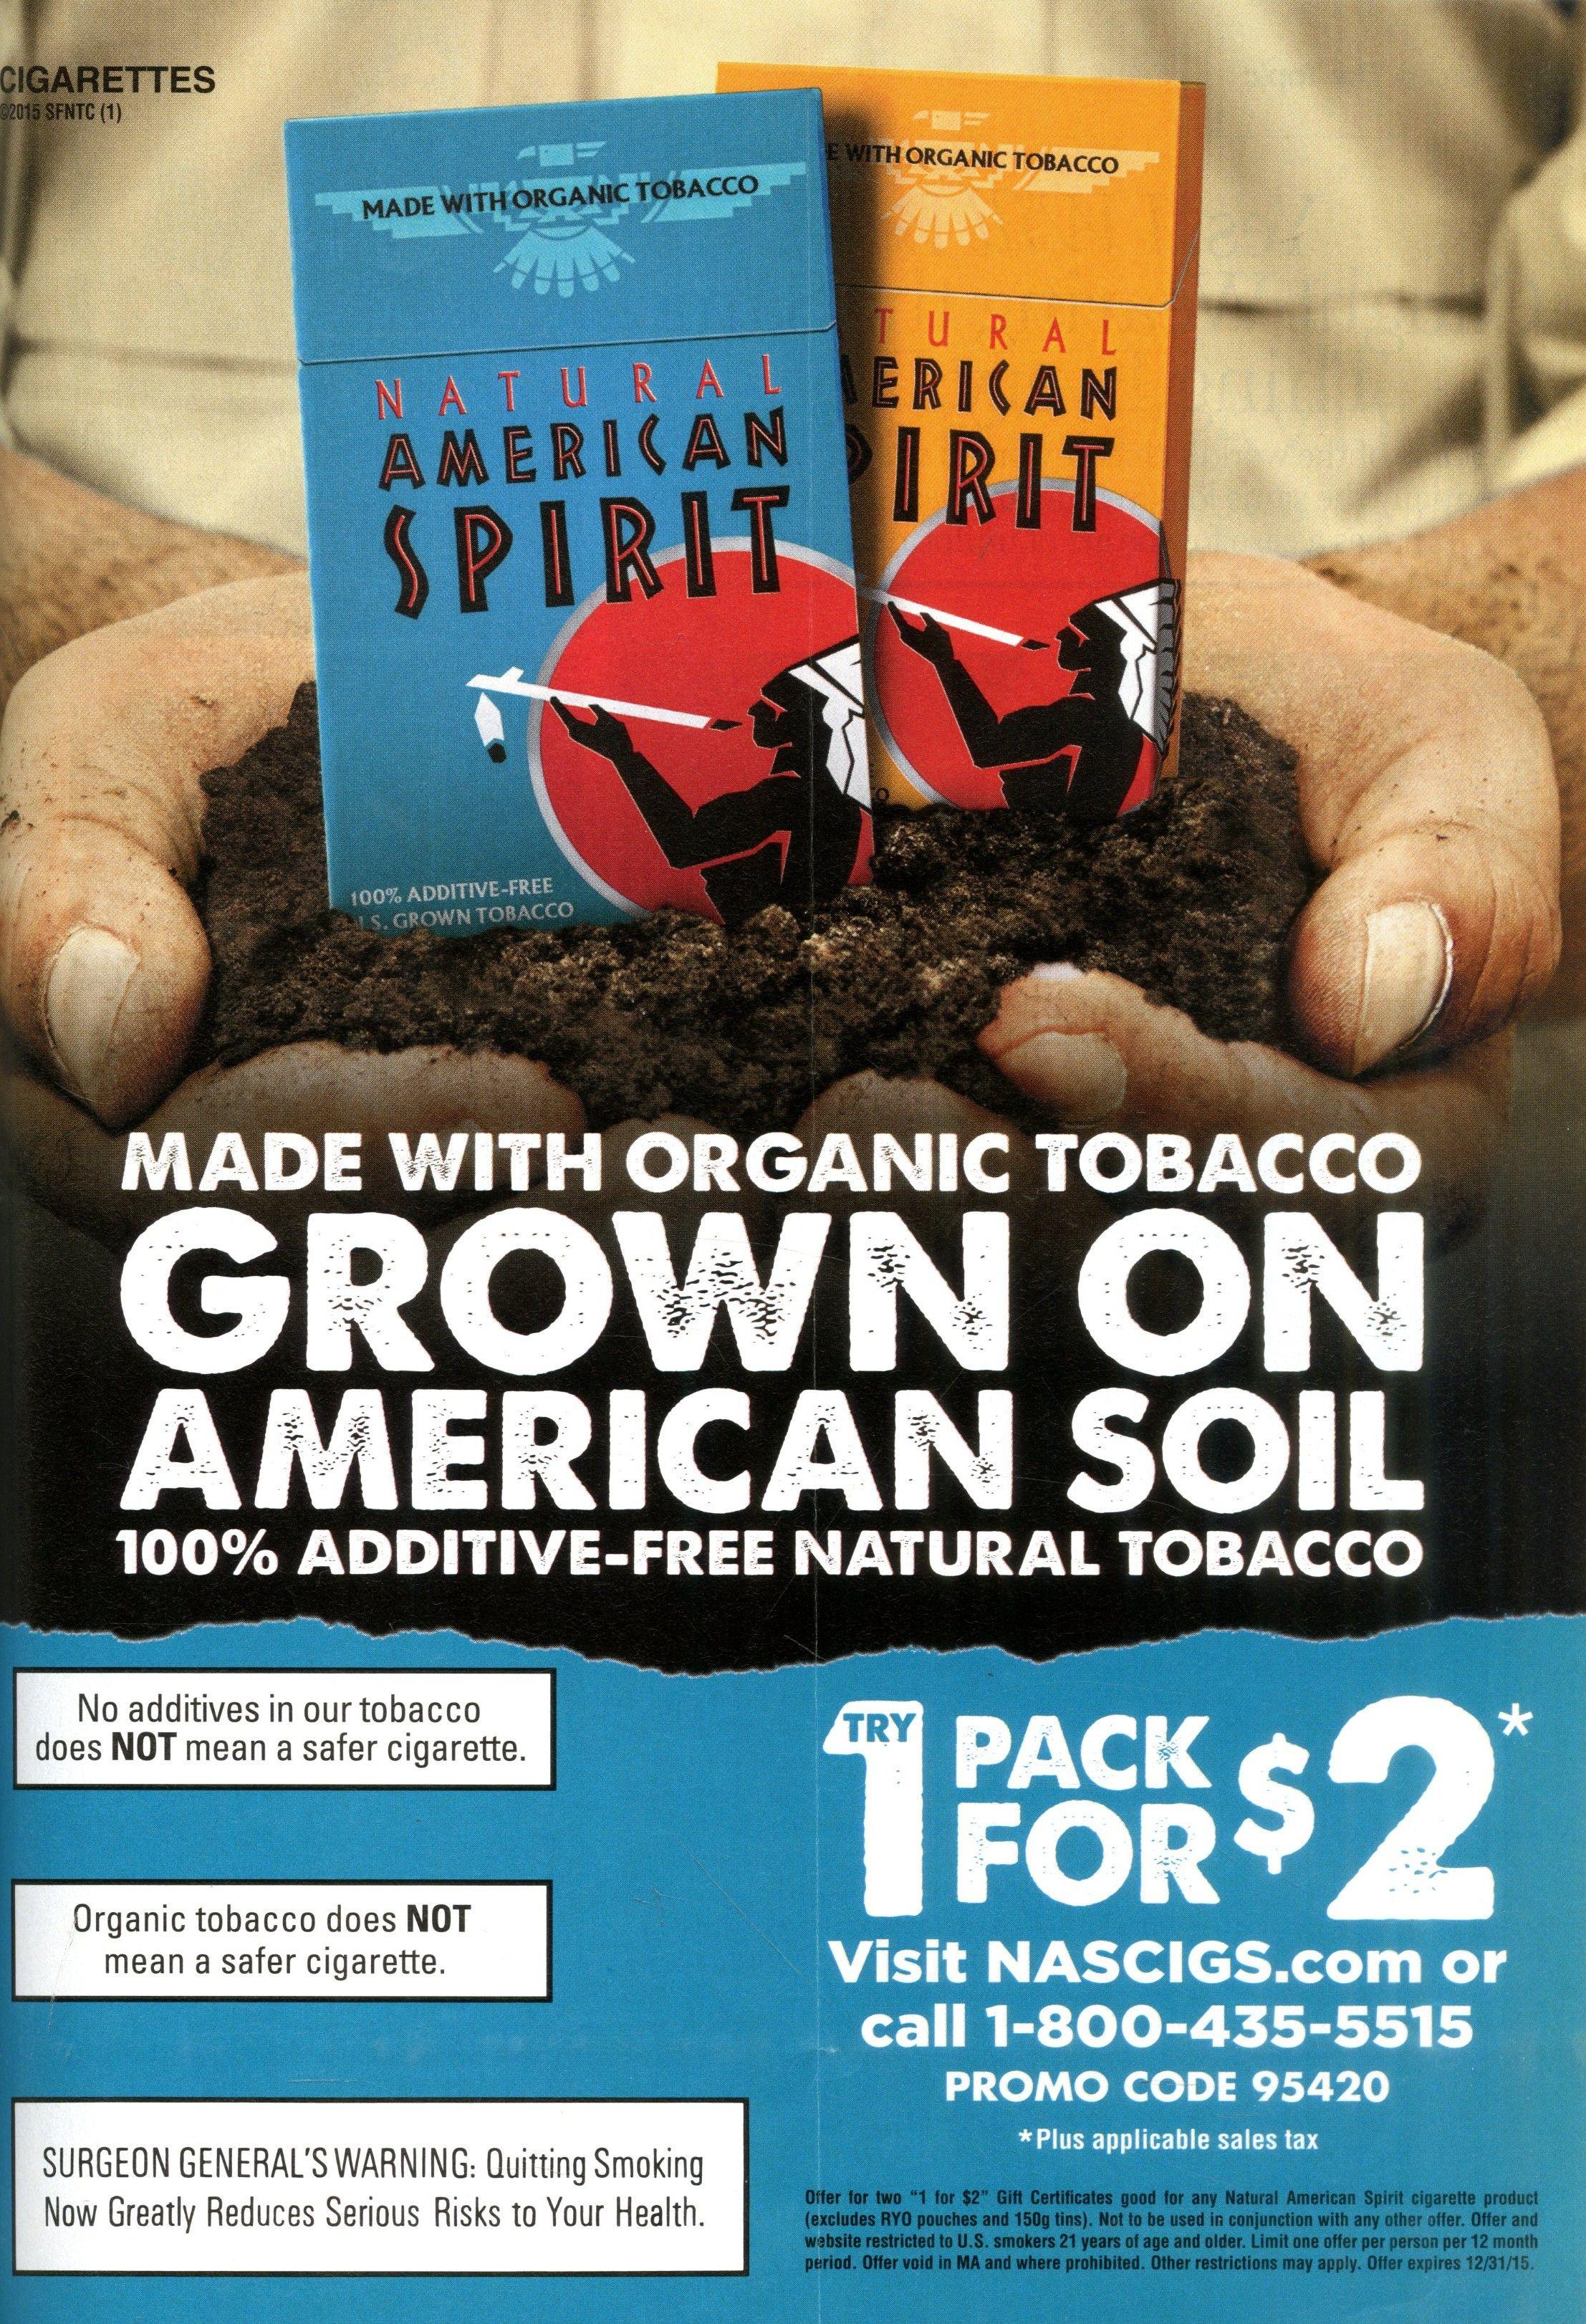 8. Natural American Spirit Cigarettes Source: Glamour, Mar. 2015 - Free Printable Cigarette Coupons